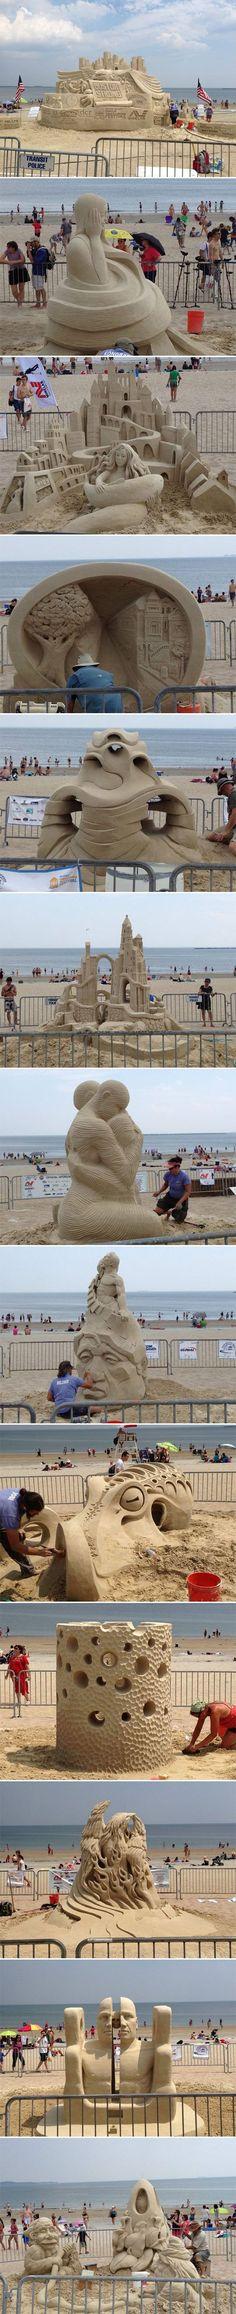 Revere Beach Sand Sculpting Festival, the octopus was the winner…